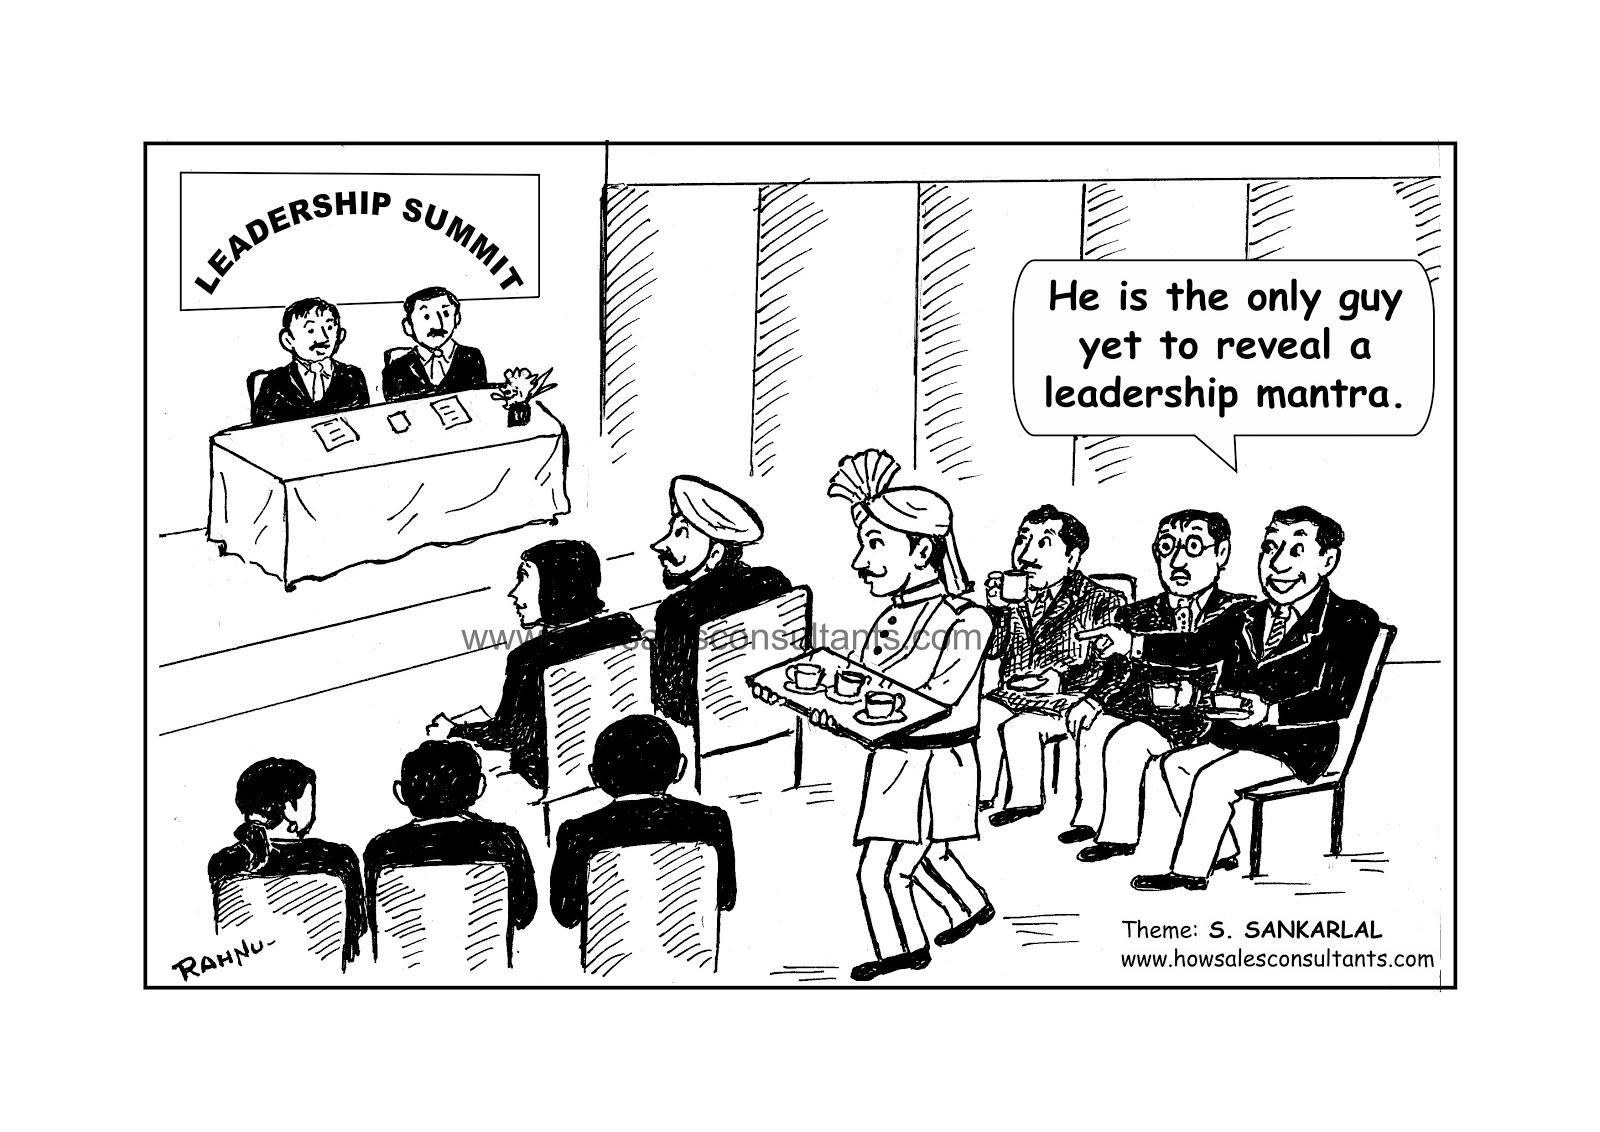 Sankarlal's Cartoons: Leadership Mantra